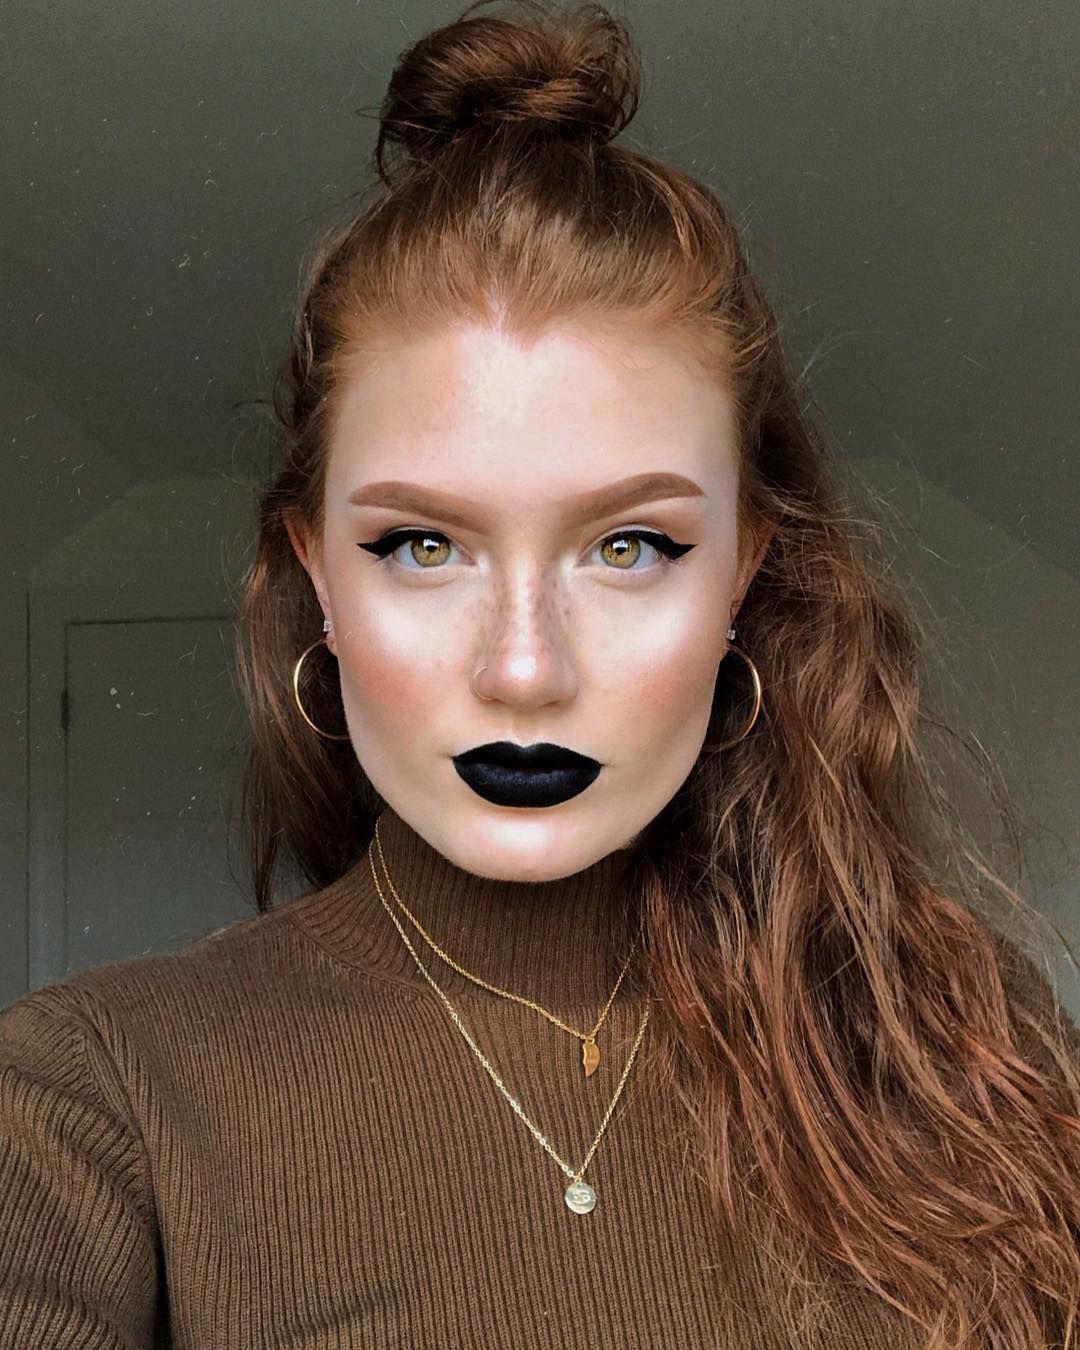 "Photo of 𝓛𝔂𝓭𝓲𝓪 𝓖𝓻𝓪𝔂𝓬𝓮 on Instagram: ""My mood lately has been minimal eye makeup + a bold lip. 💄🦇 – – – – – – BASE: @niveamenusa sensitive shave balm @benefitcosmetics…"""